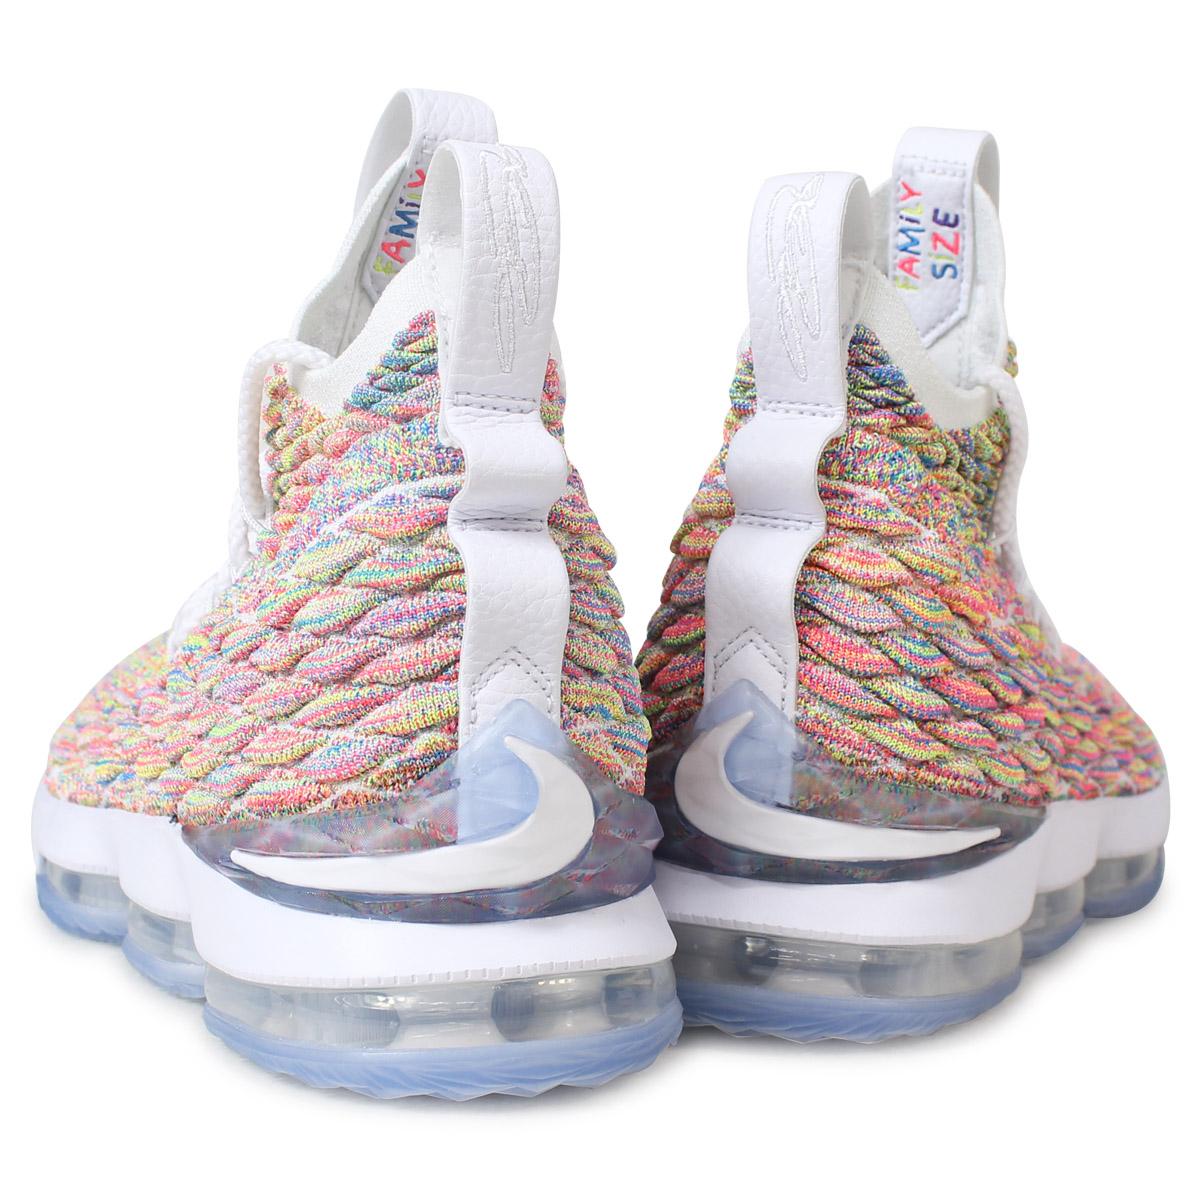 2710046dbfc NIKE LEBRON 15 EP CEREAL Nike Revlon 15 sneakers men AO1754-900 white  185